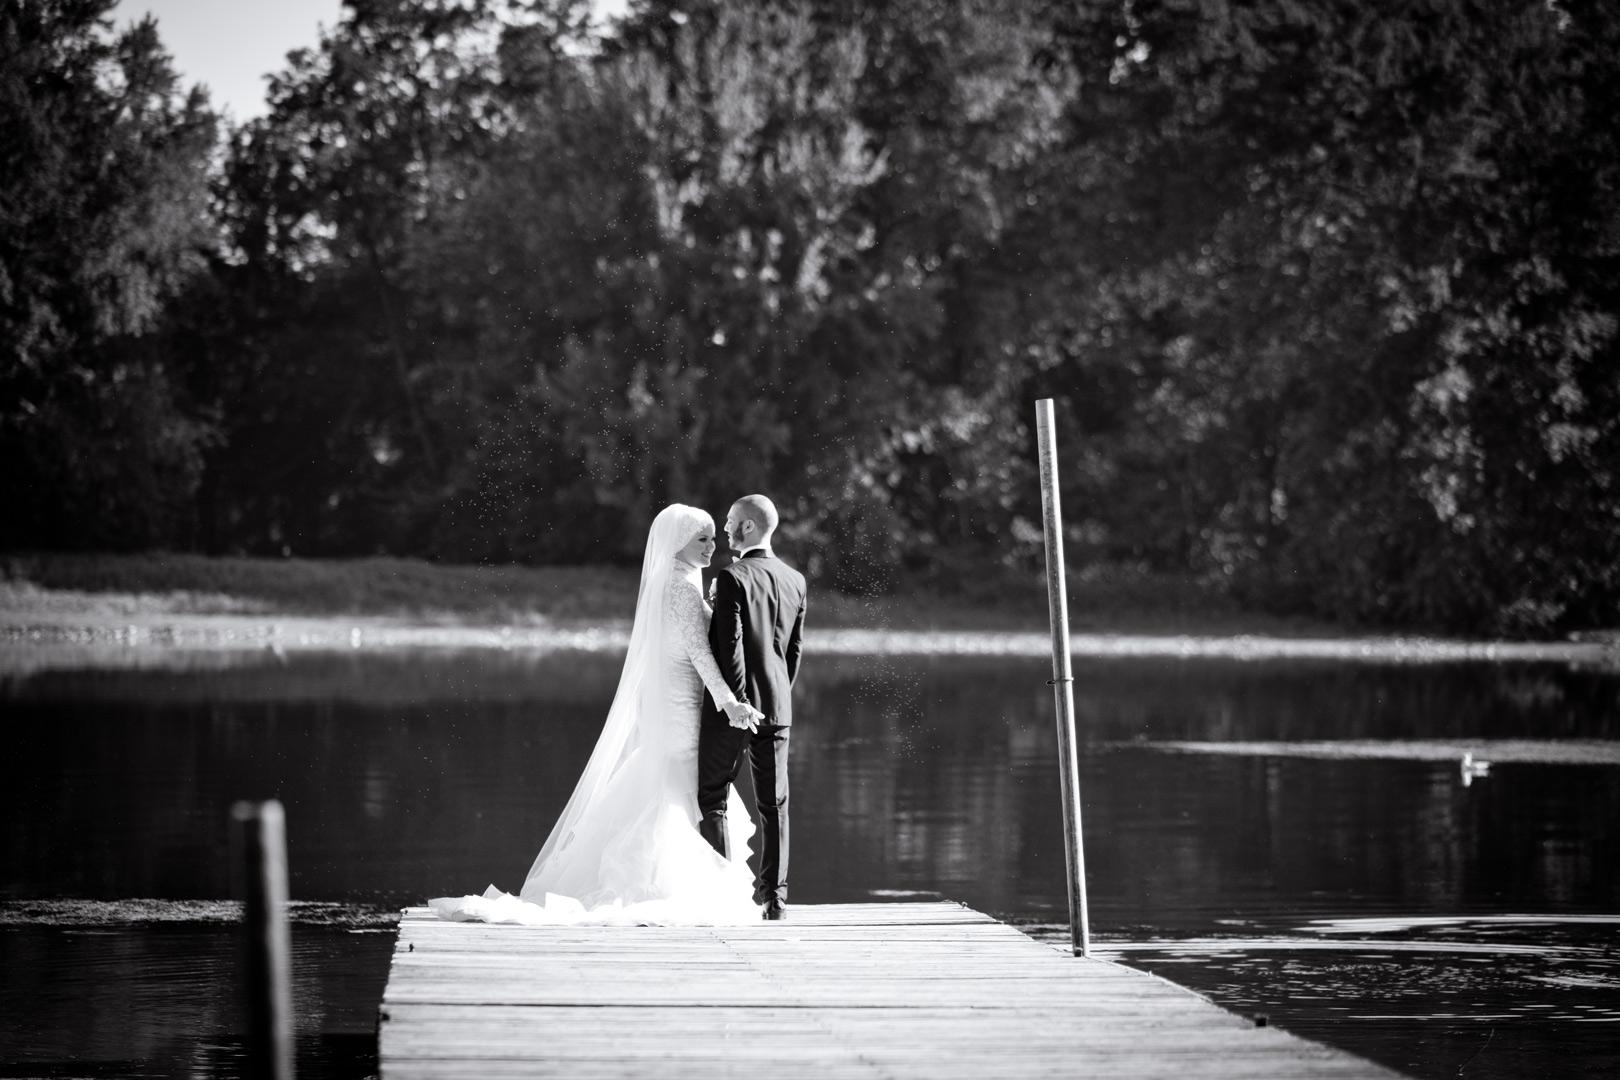 photographe-natercia-mariage-montreal